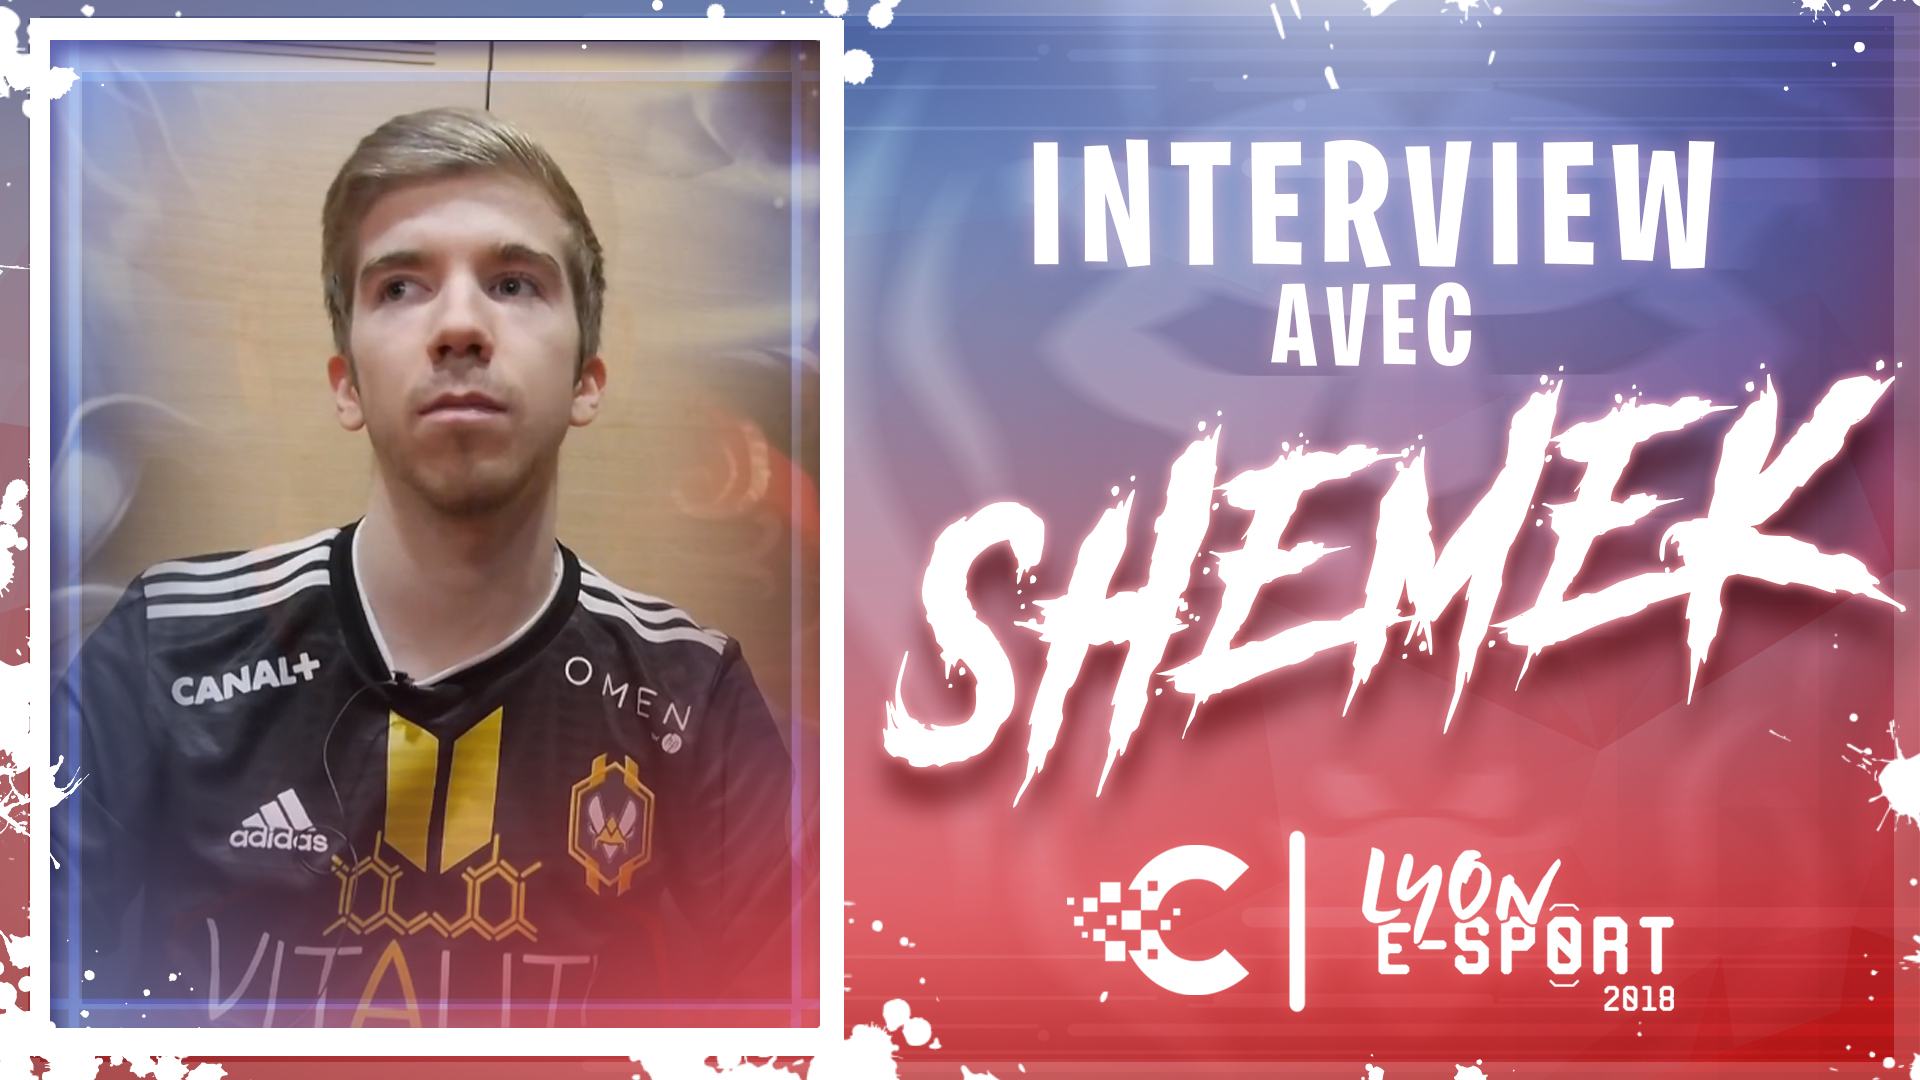 shemek interview